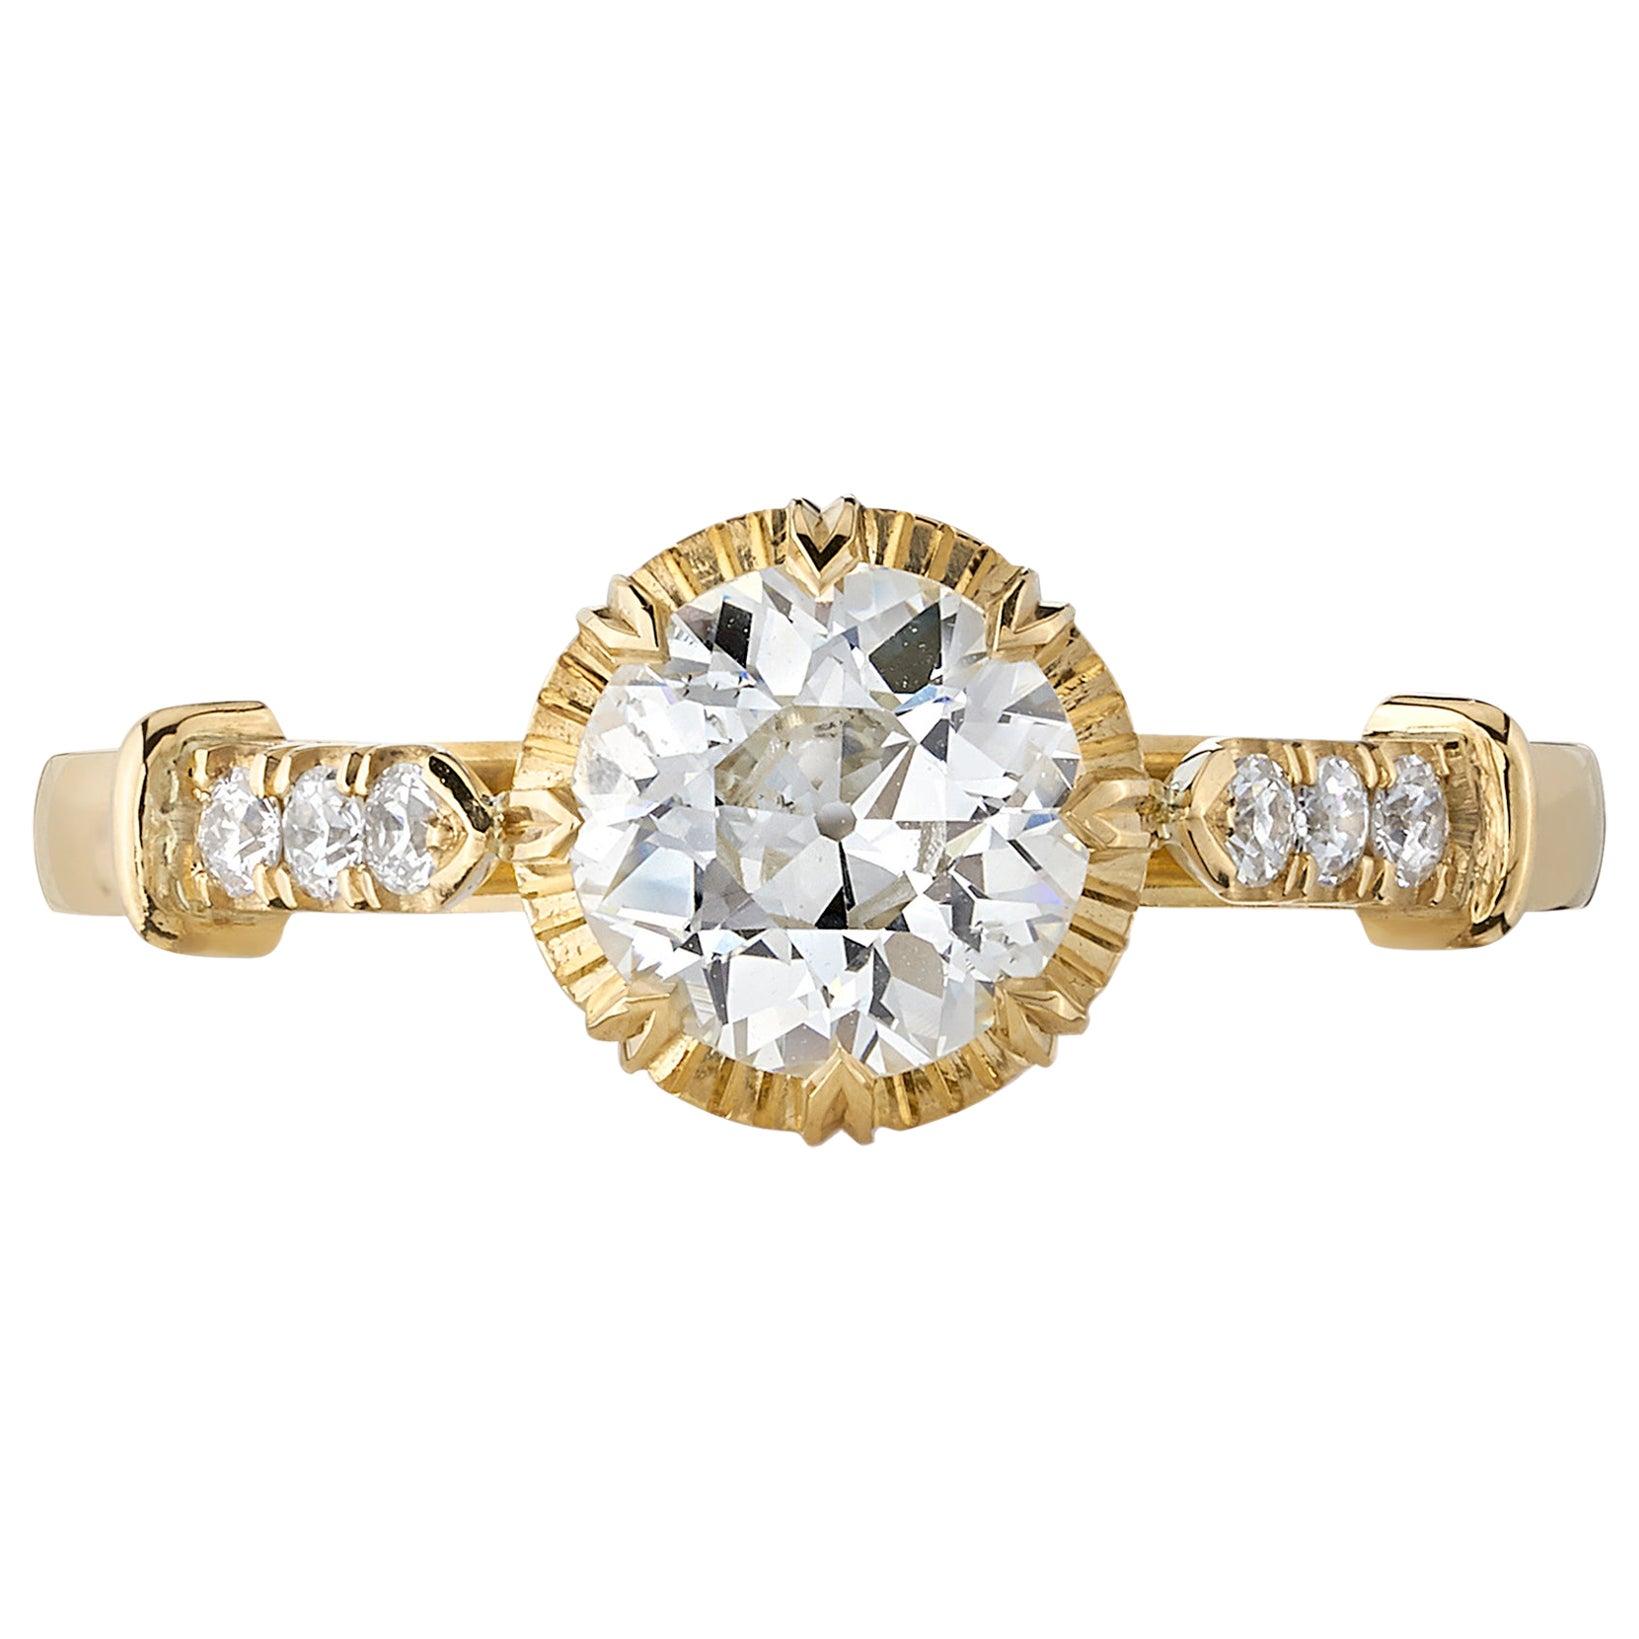 0.85 Carat Old European Cut Diamond Set in a Yellow Gold Engagement Ring